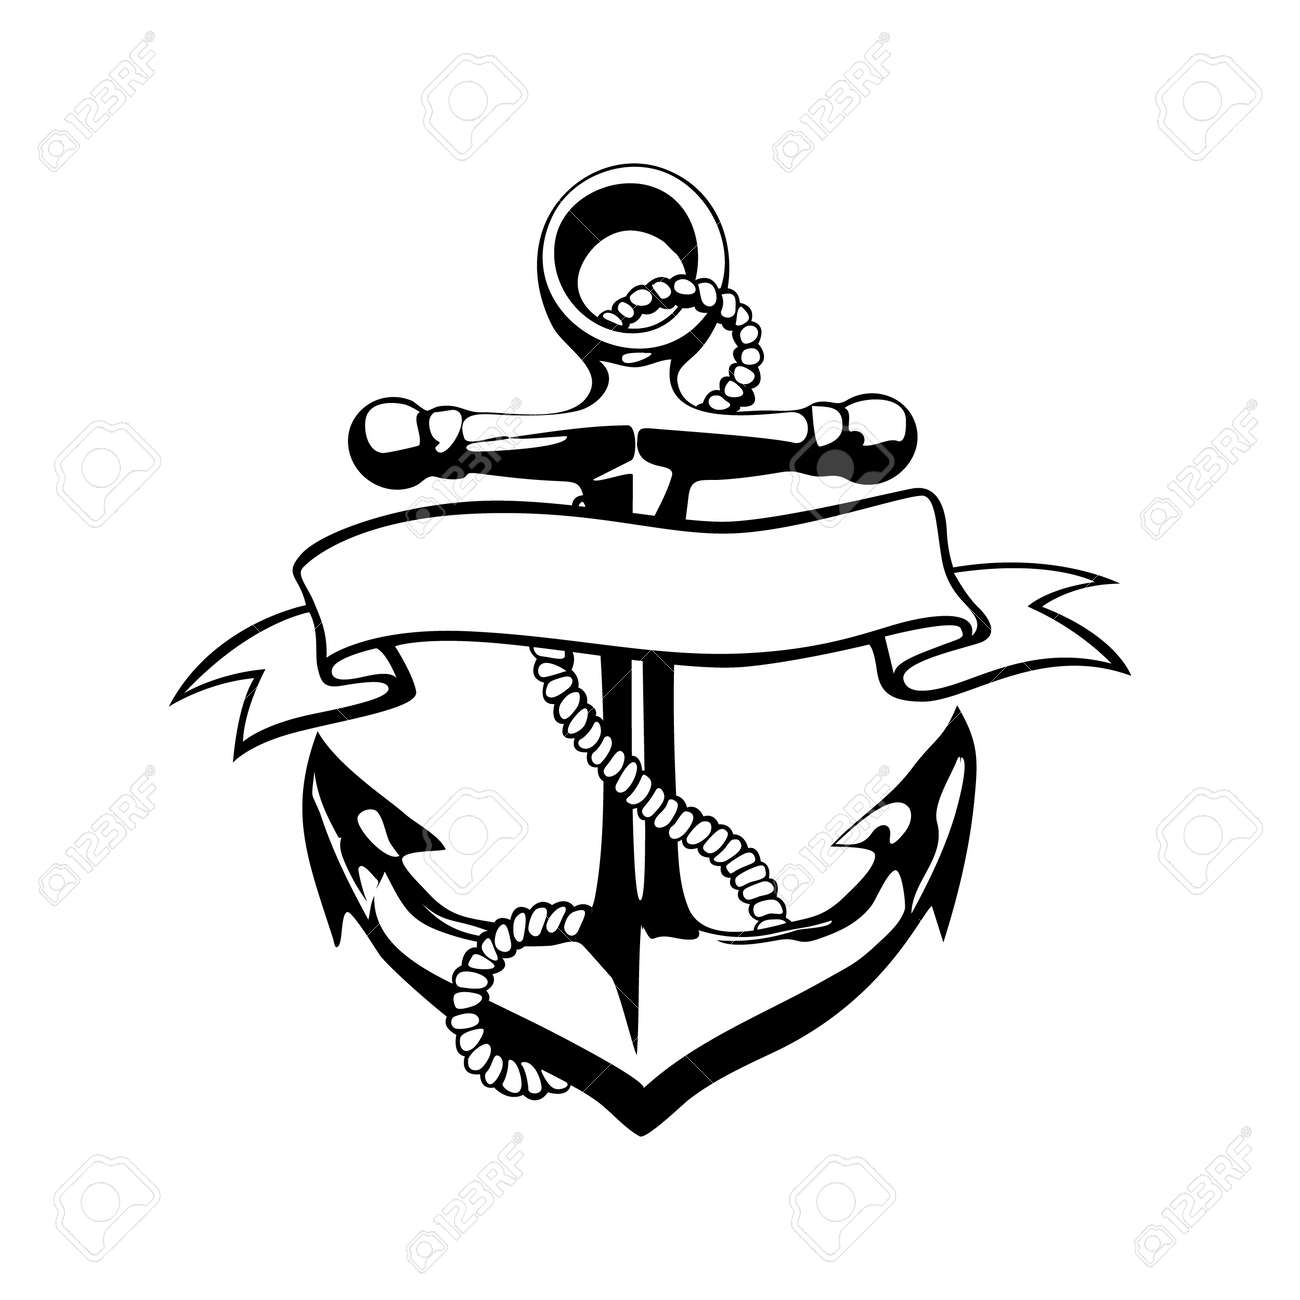 Grunge Diseño Del Ancla Del Icono Del Vector Del Tatuaje Logotipo